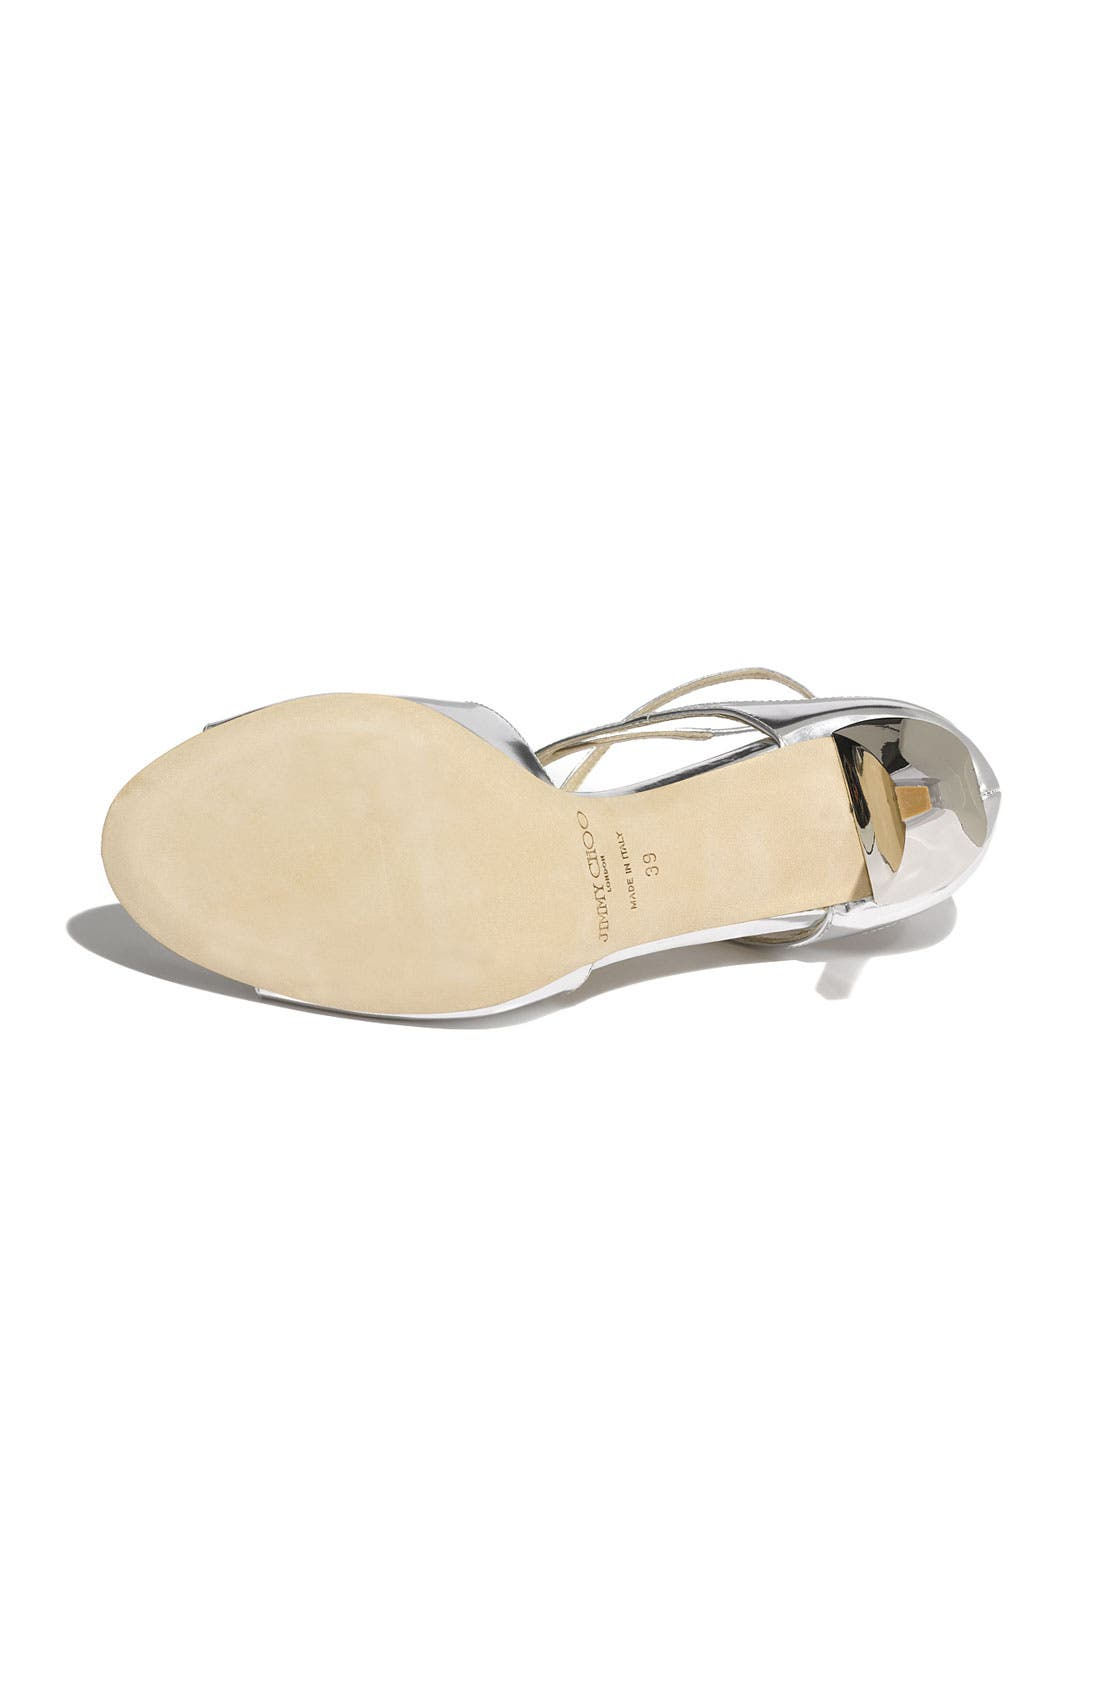 'Ivette' Strap Sandal,                             Alternate thumbnail 4, color,                             040